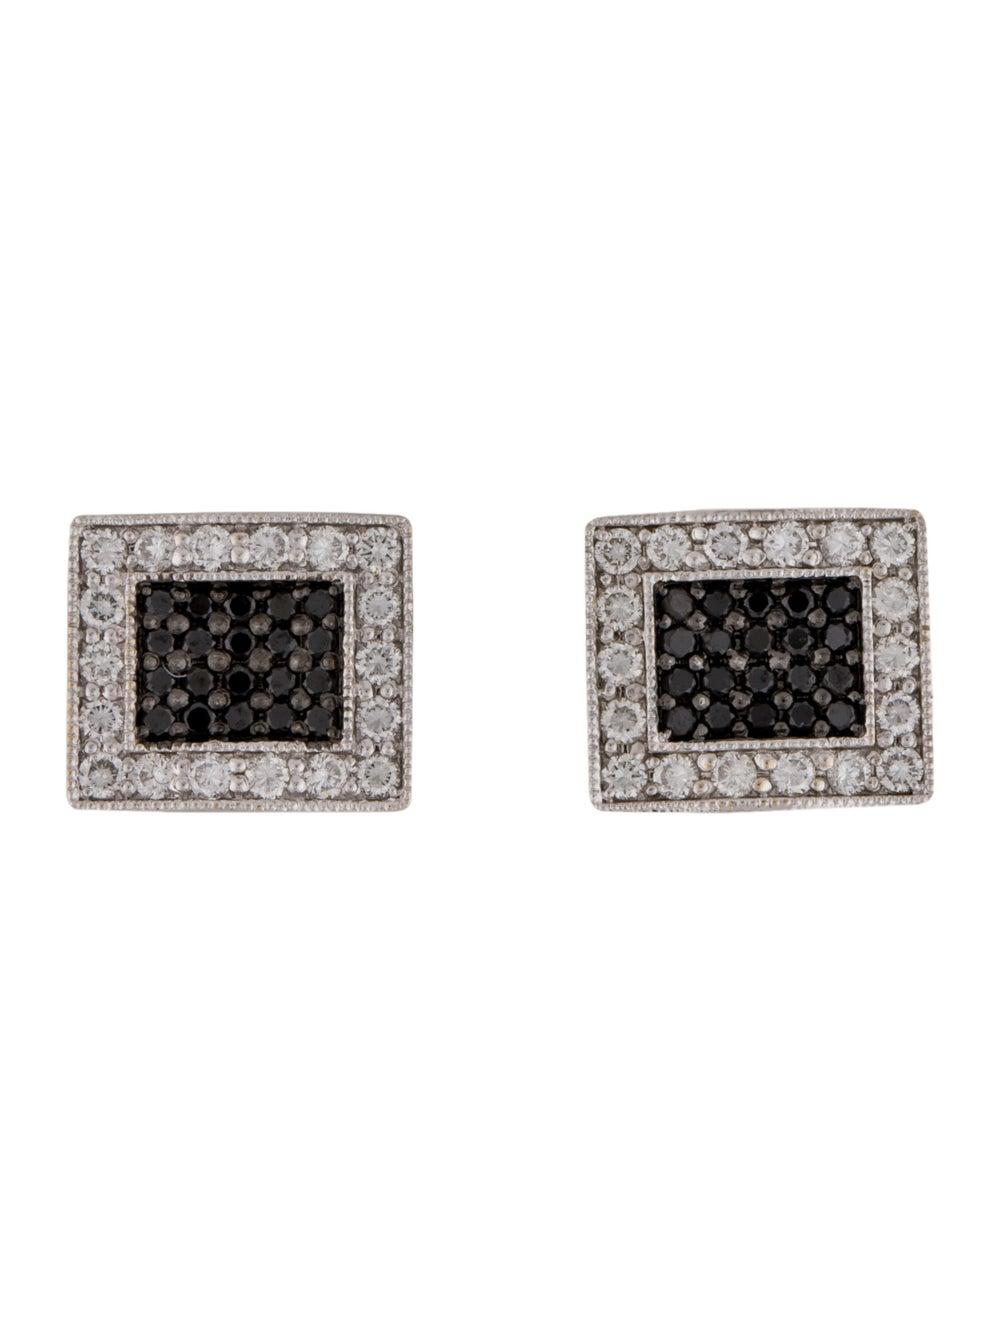 Earrings 18K Diamond Stud Earrings White - image 1